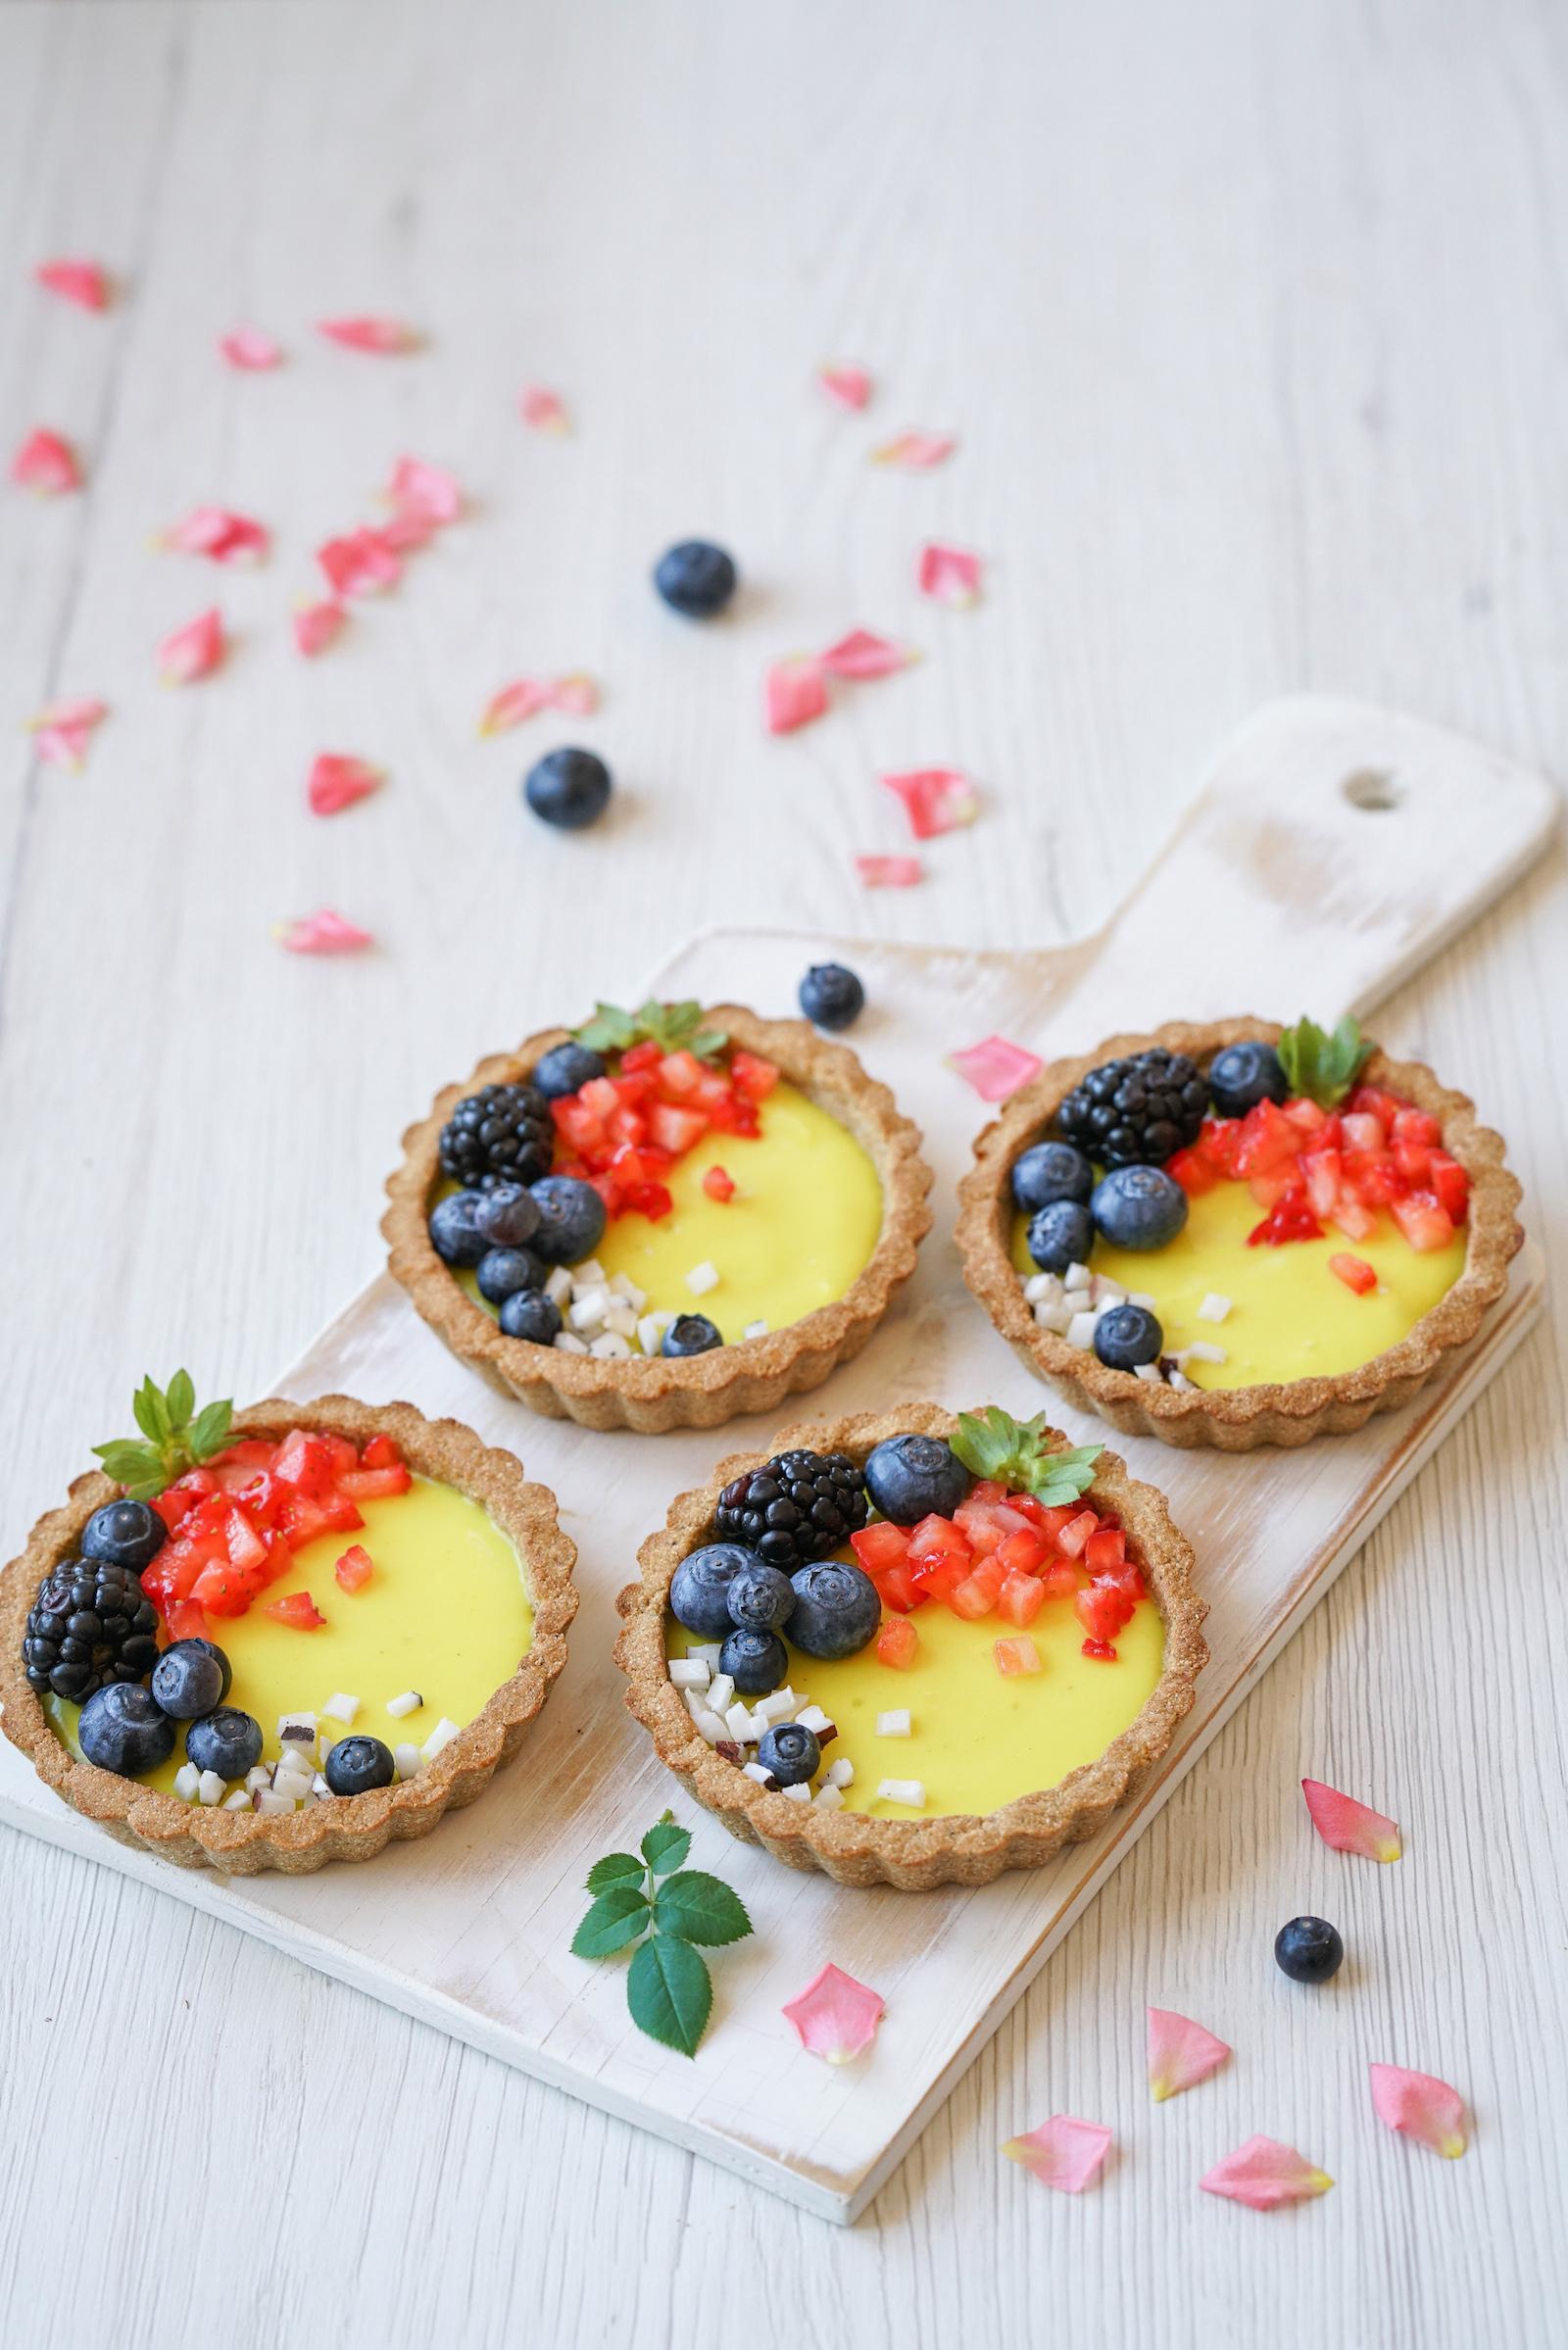 AIP Italian Sweet Tarts - AIP Italian Food Recipes from the AIP Italian Cookbook